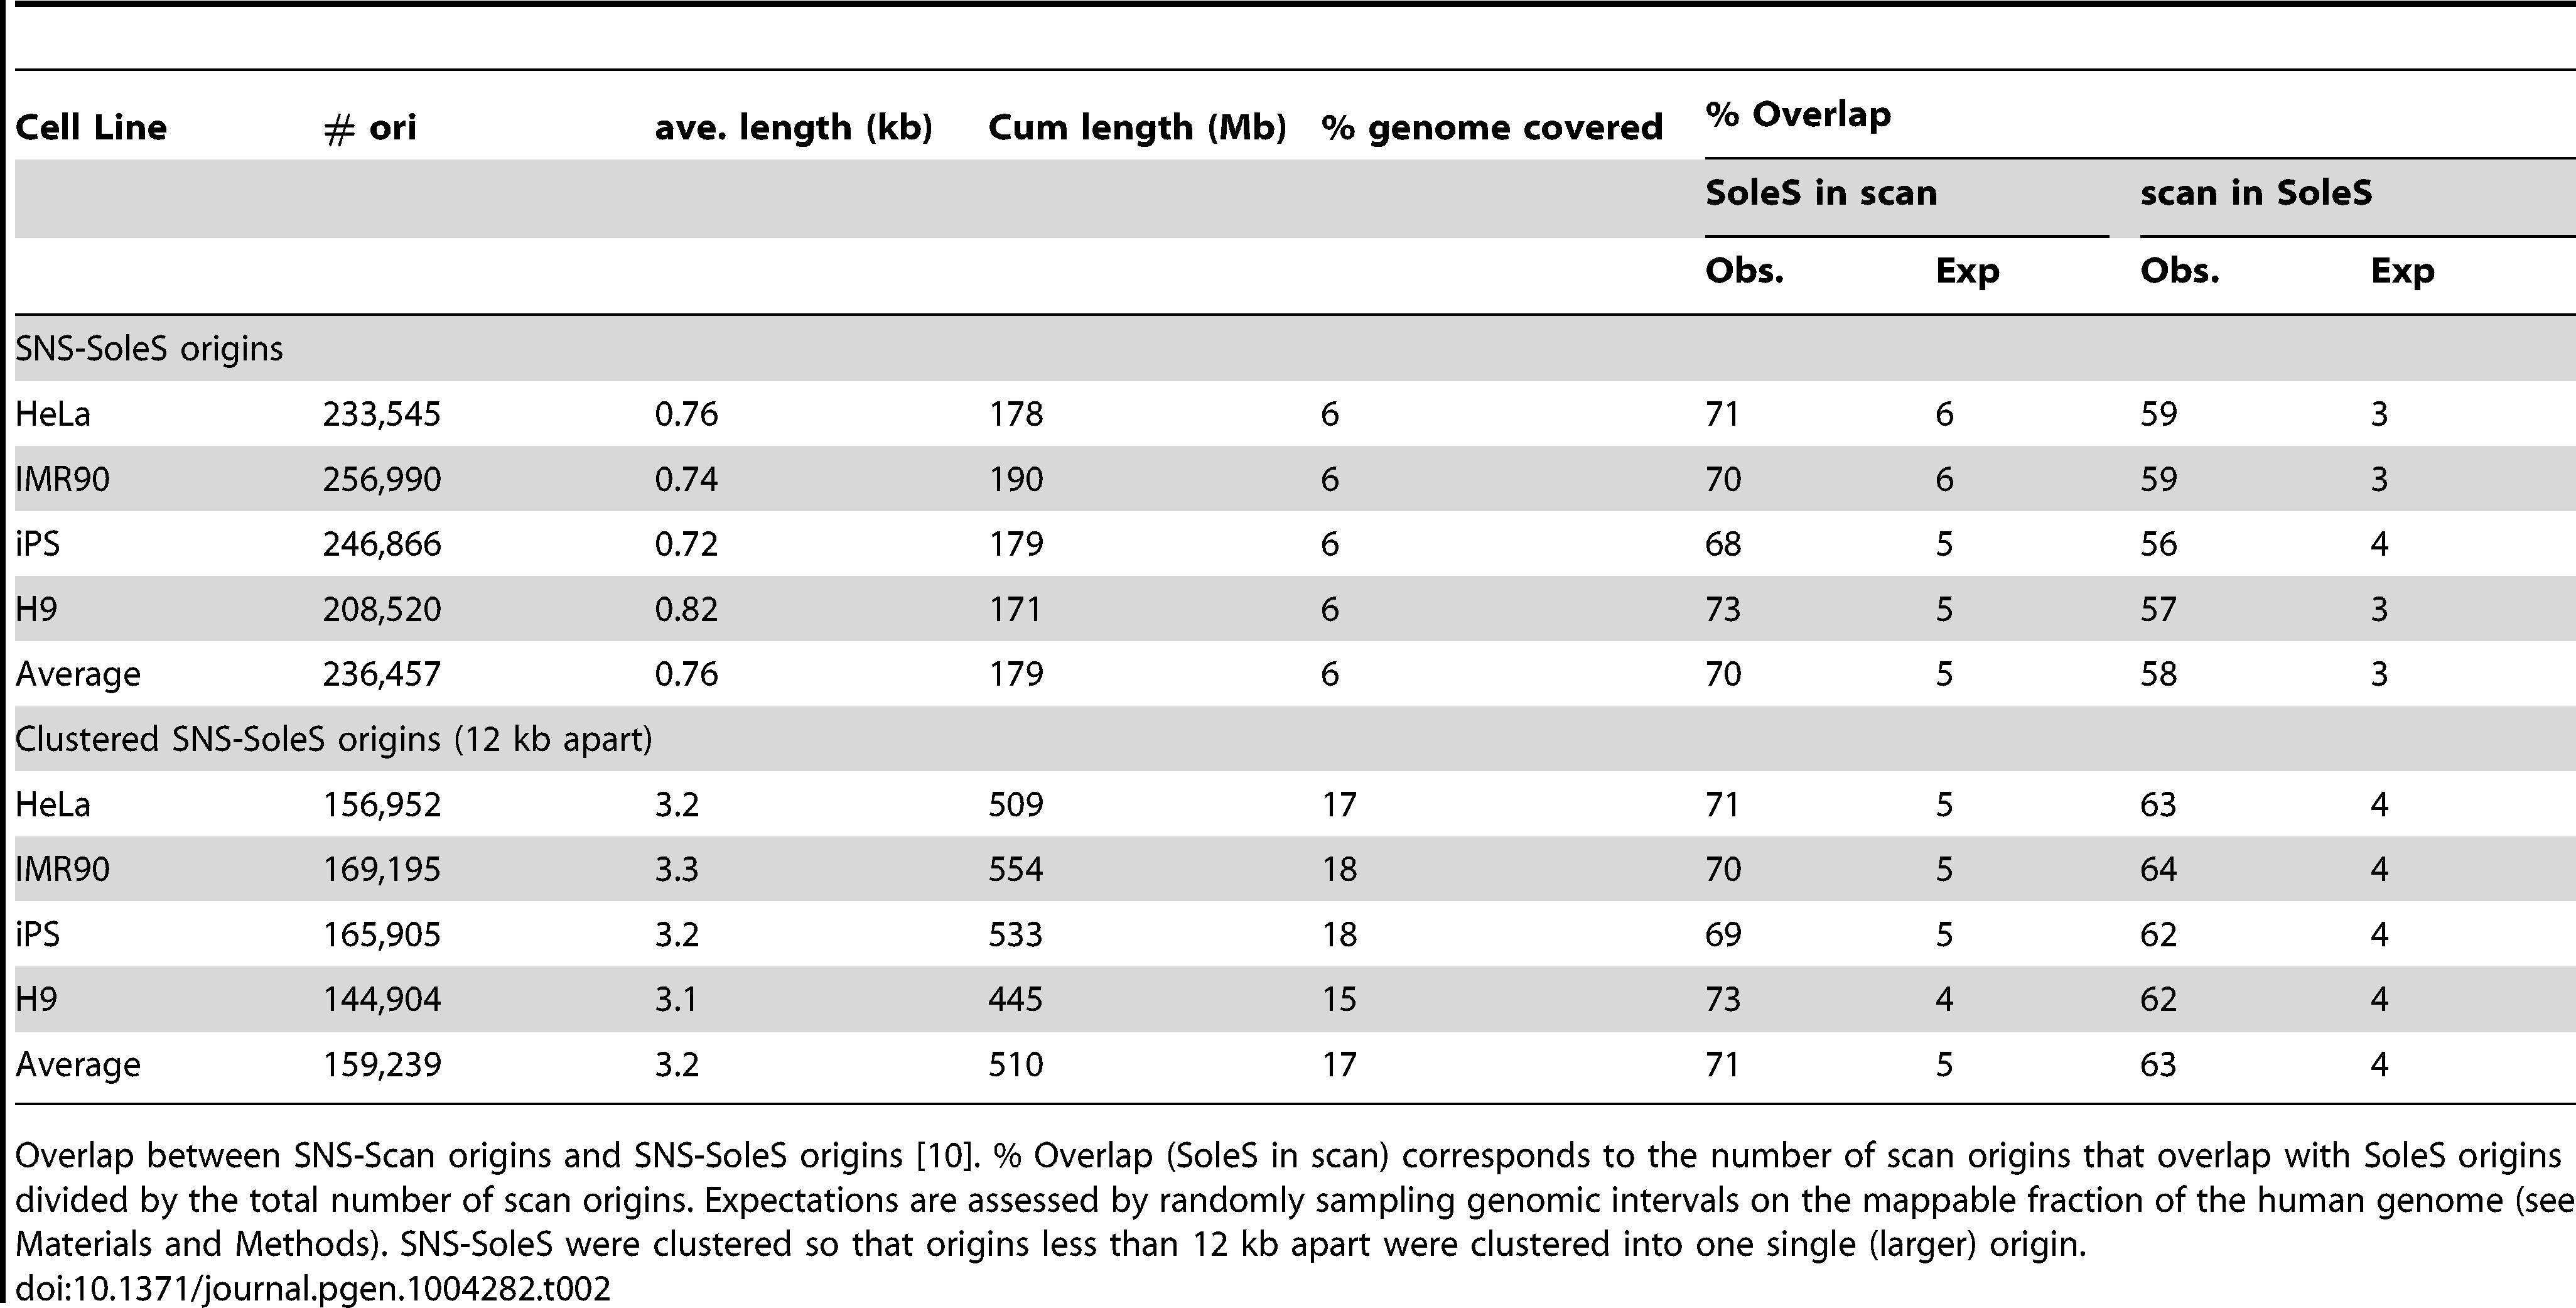 Comparison of SNS-scan origins and SNS-SoleS origins.